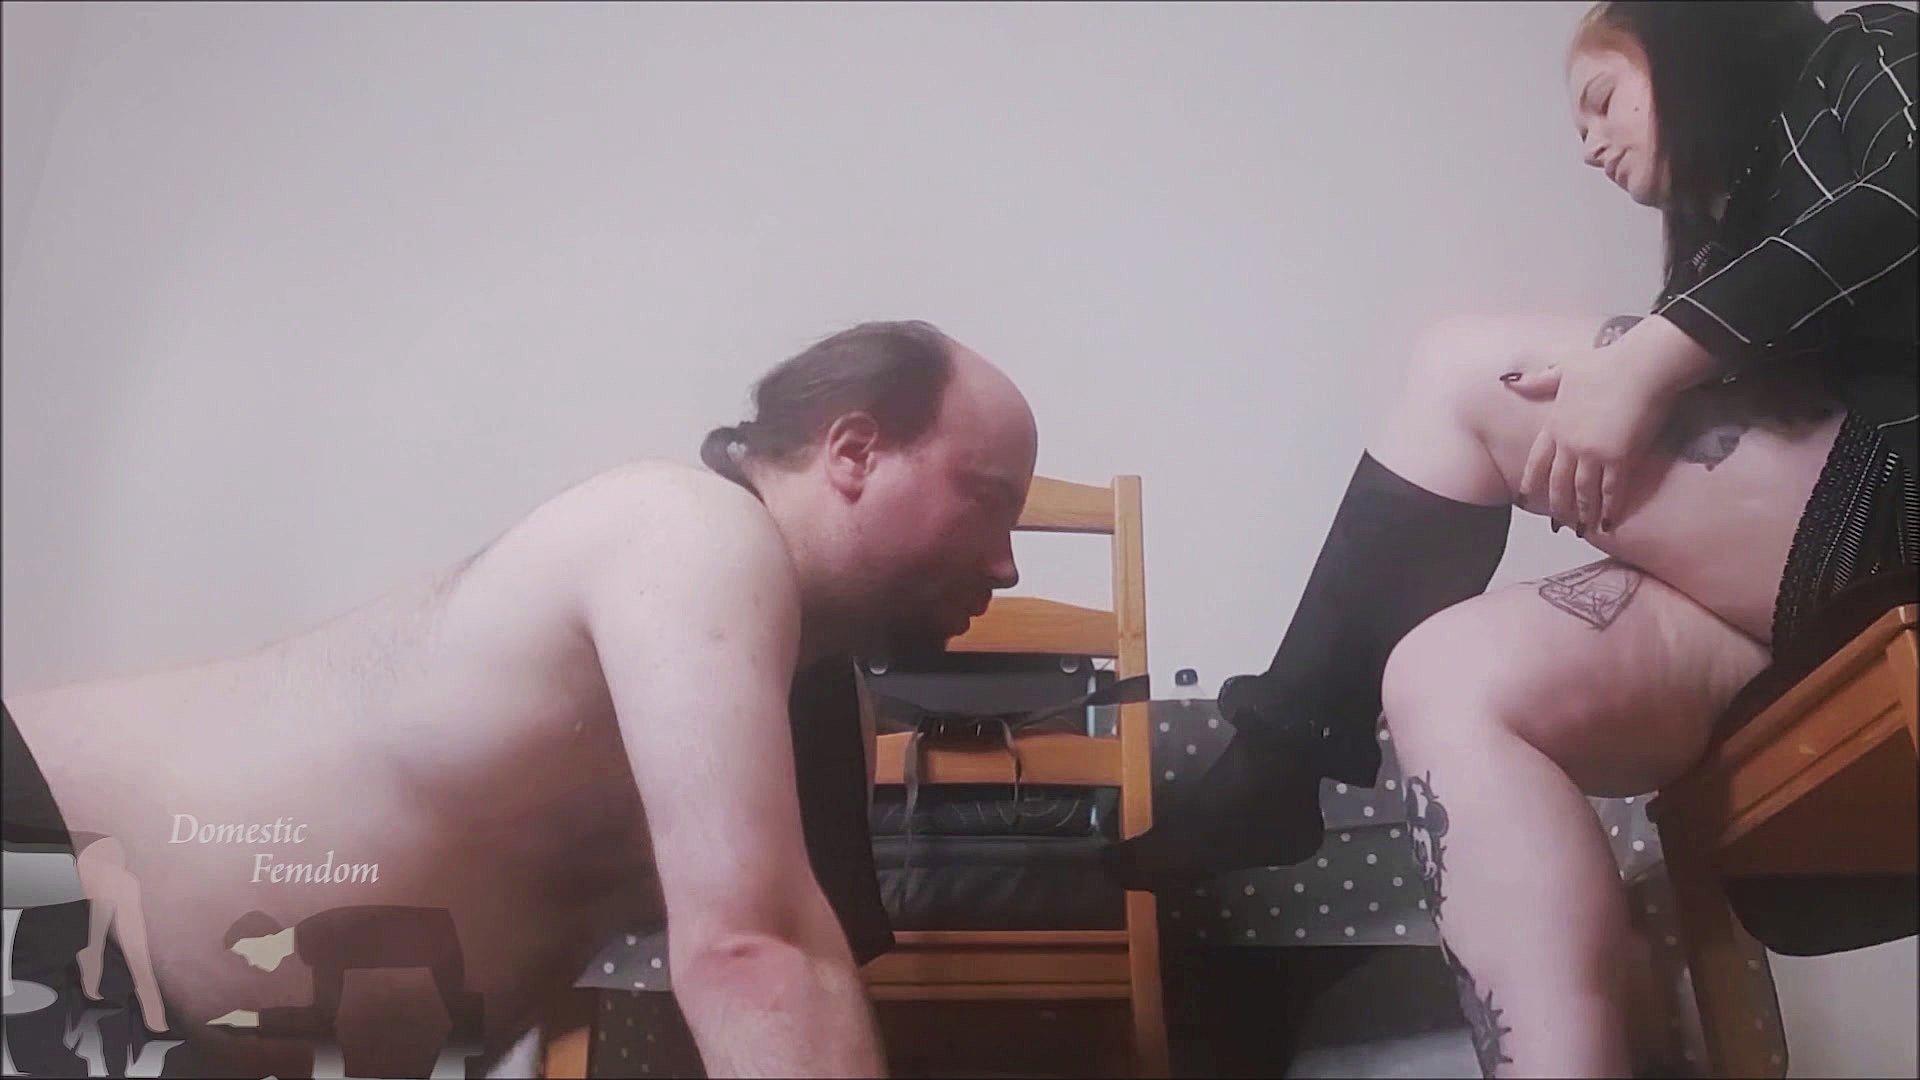 stocking1 - A Stocking and Foot Reward